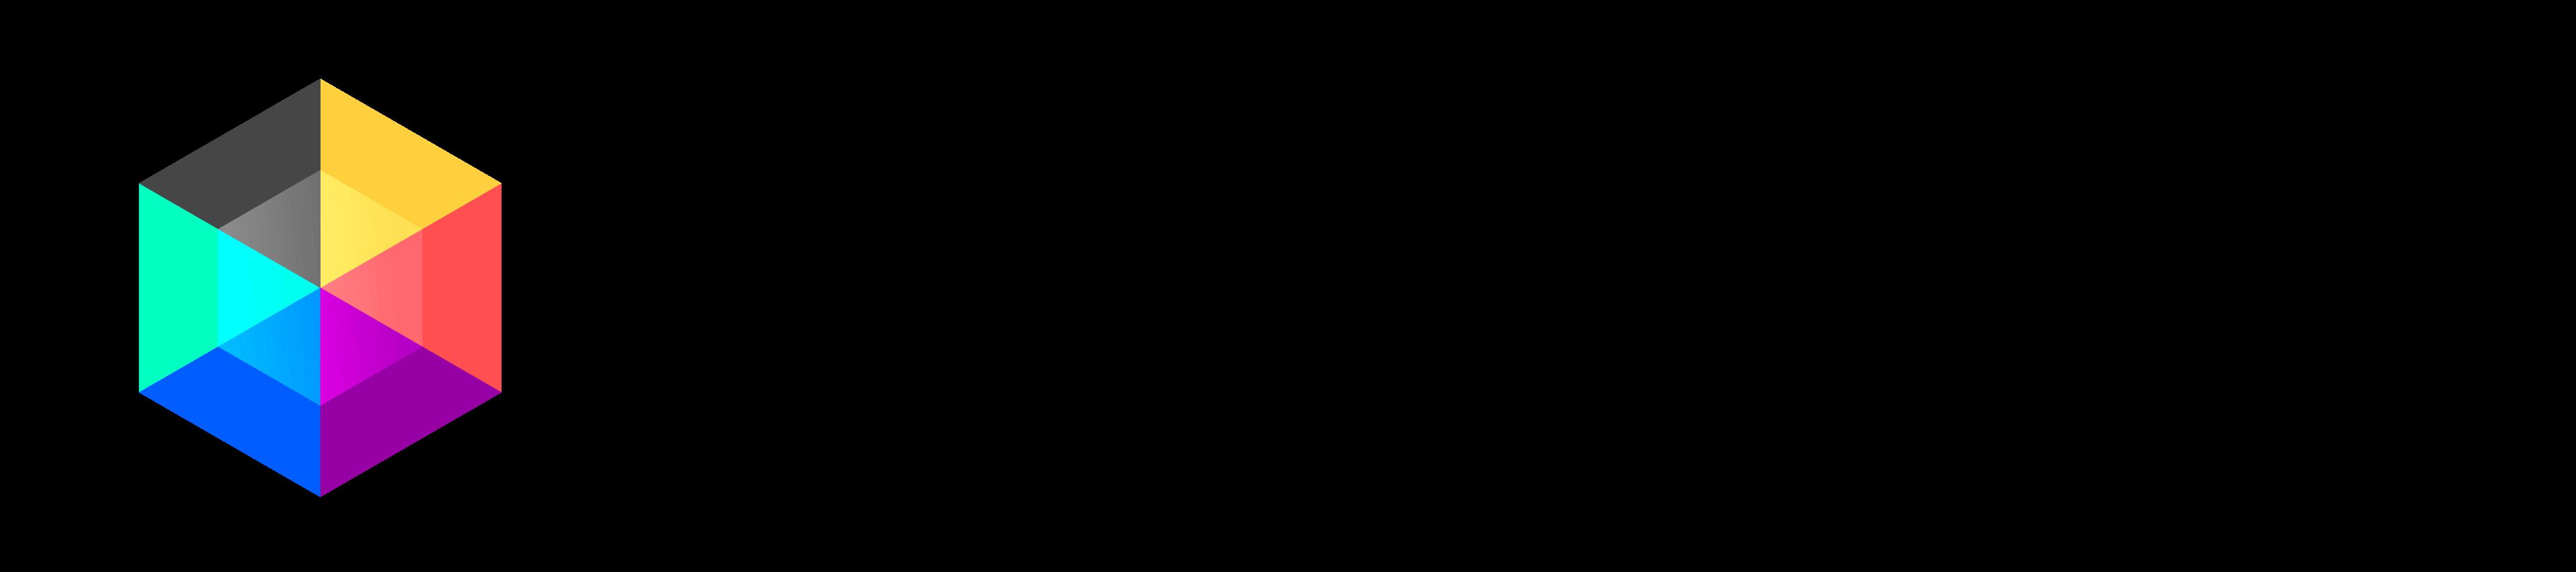 Polyverse logo color pluginboutique